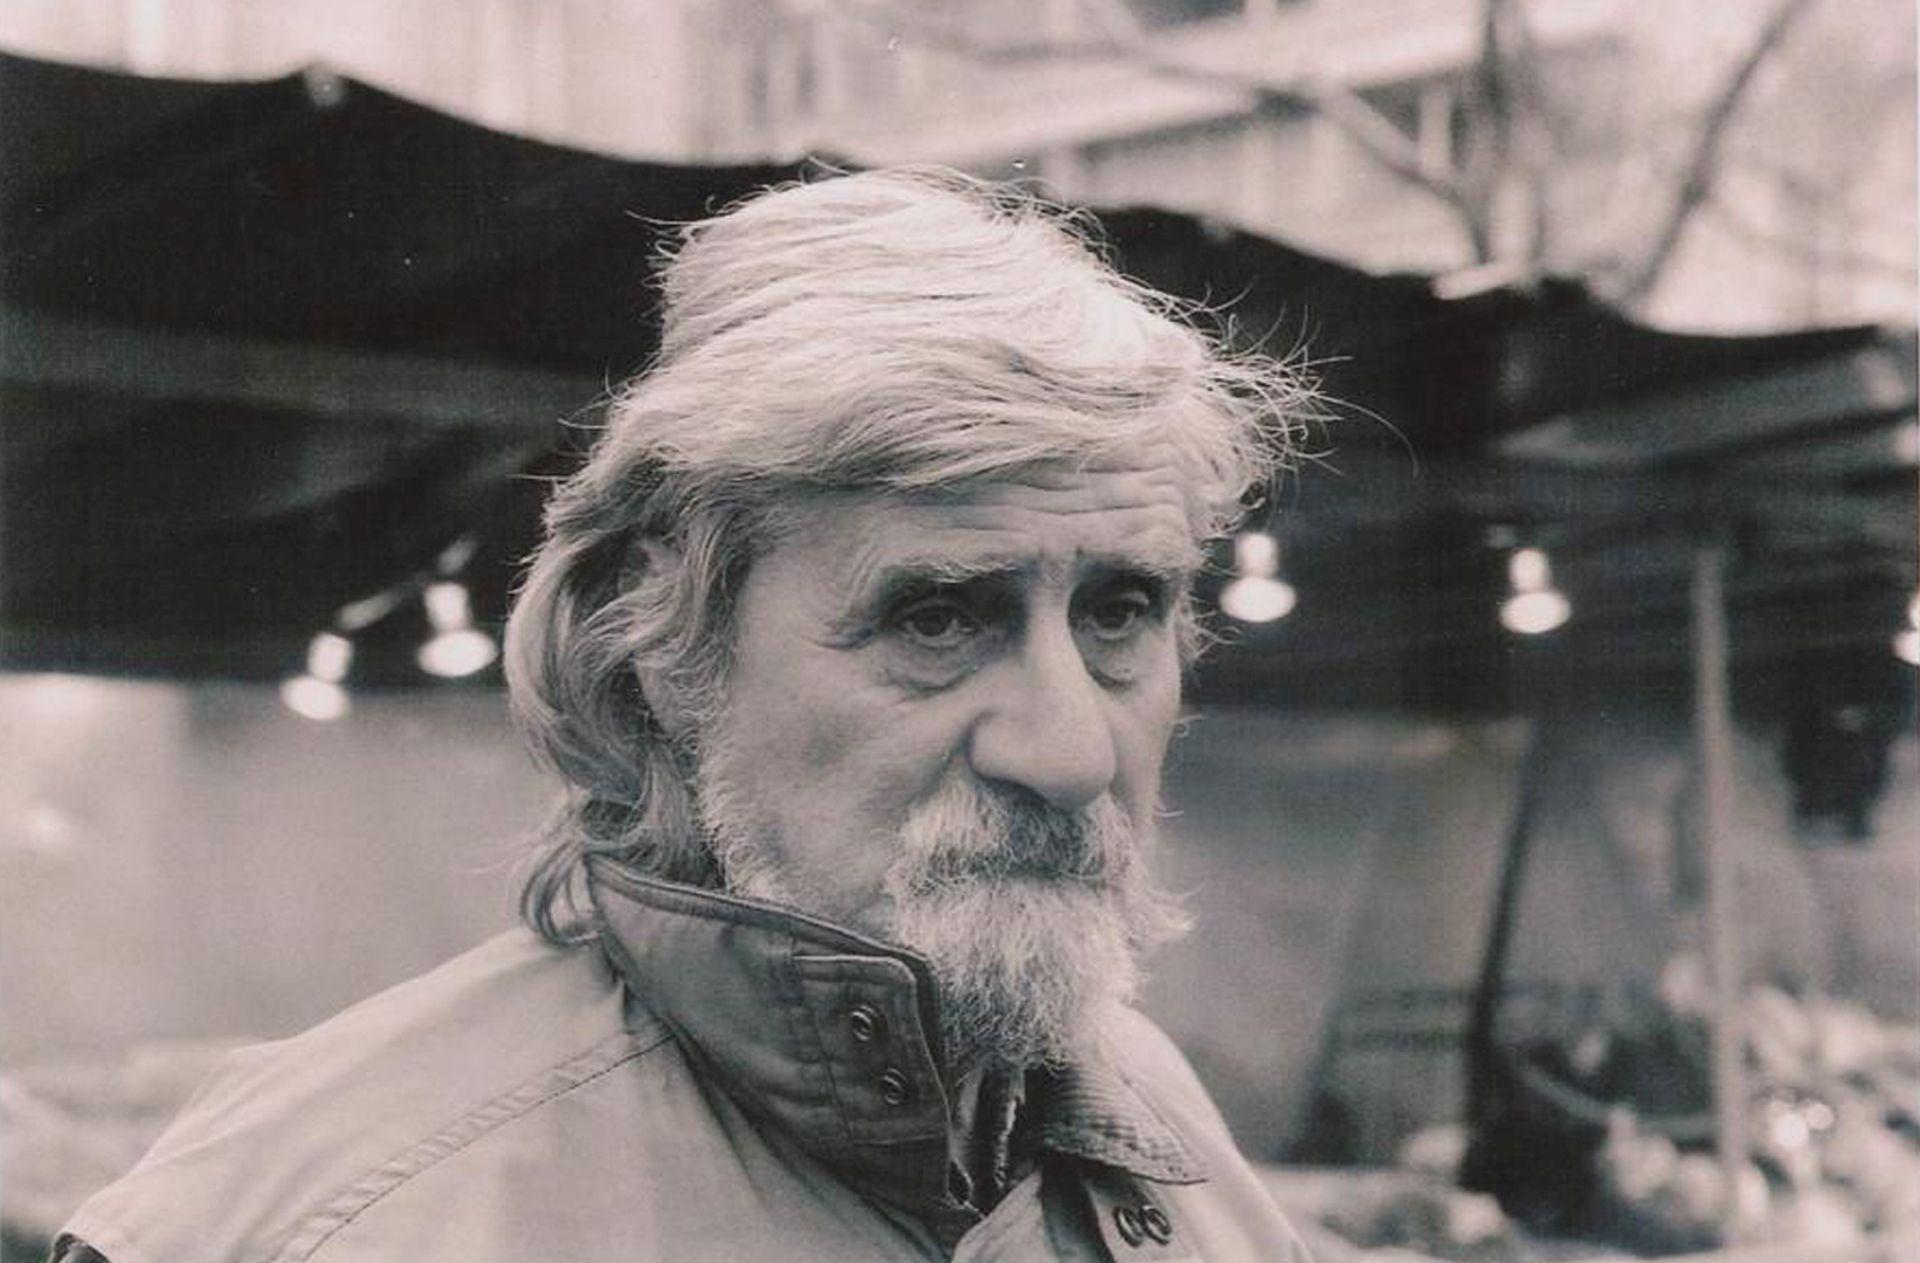 Preminuo francusko-hrvatski slikar Louis Fachat